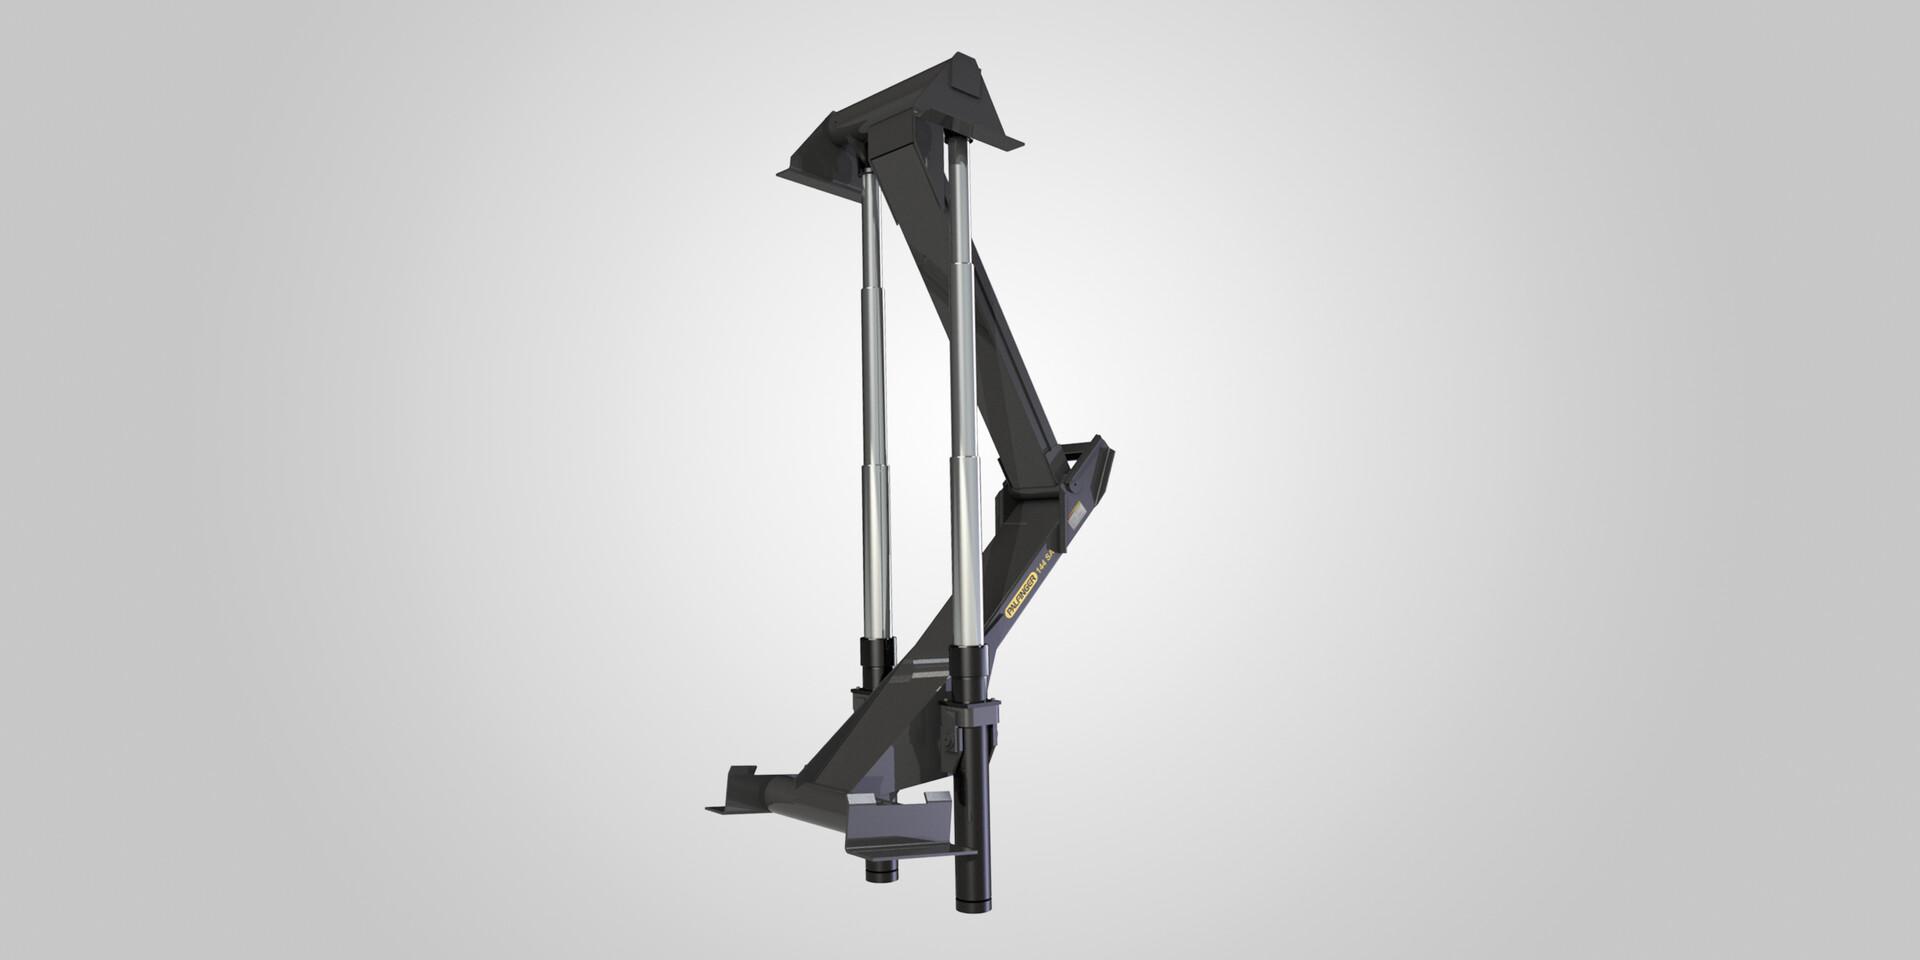 Olympic Twin stabilized telescopic hoists   PALFINGER